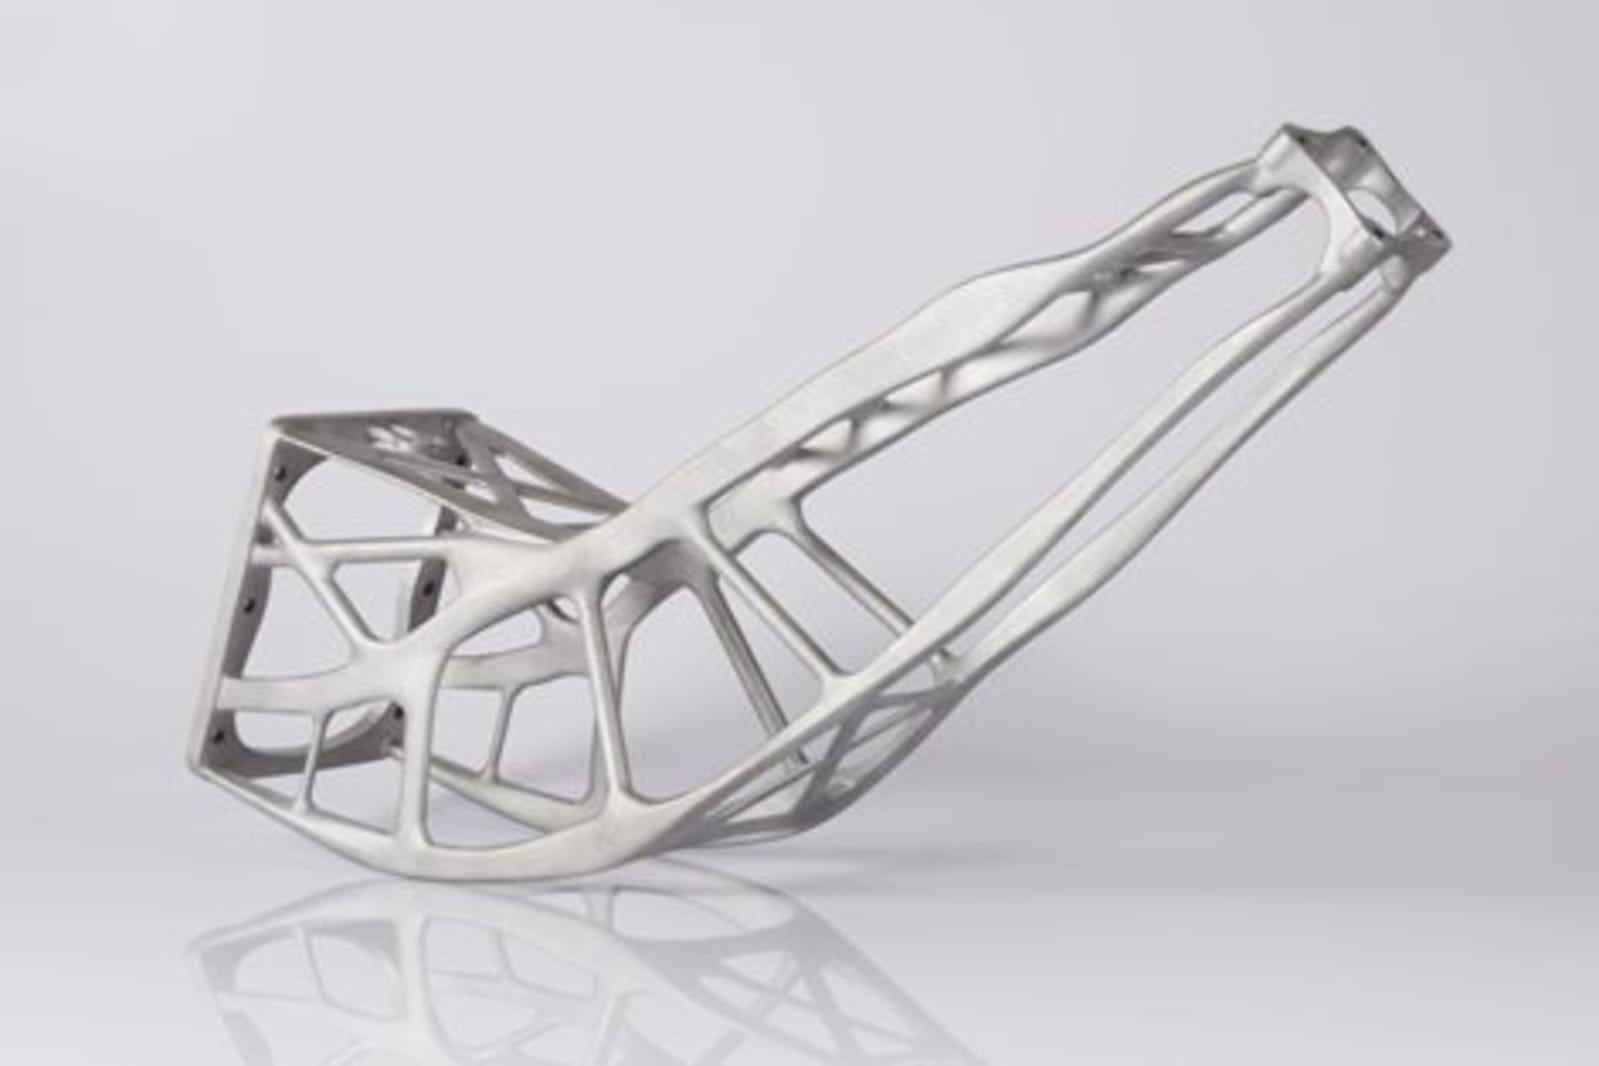 High Accuracy Aluminum Prototype Part